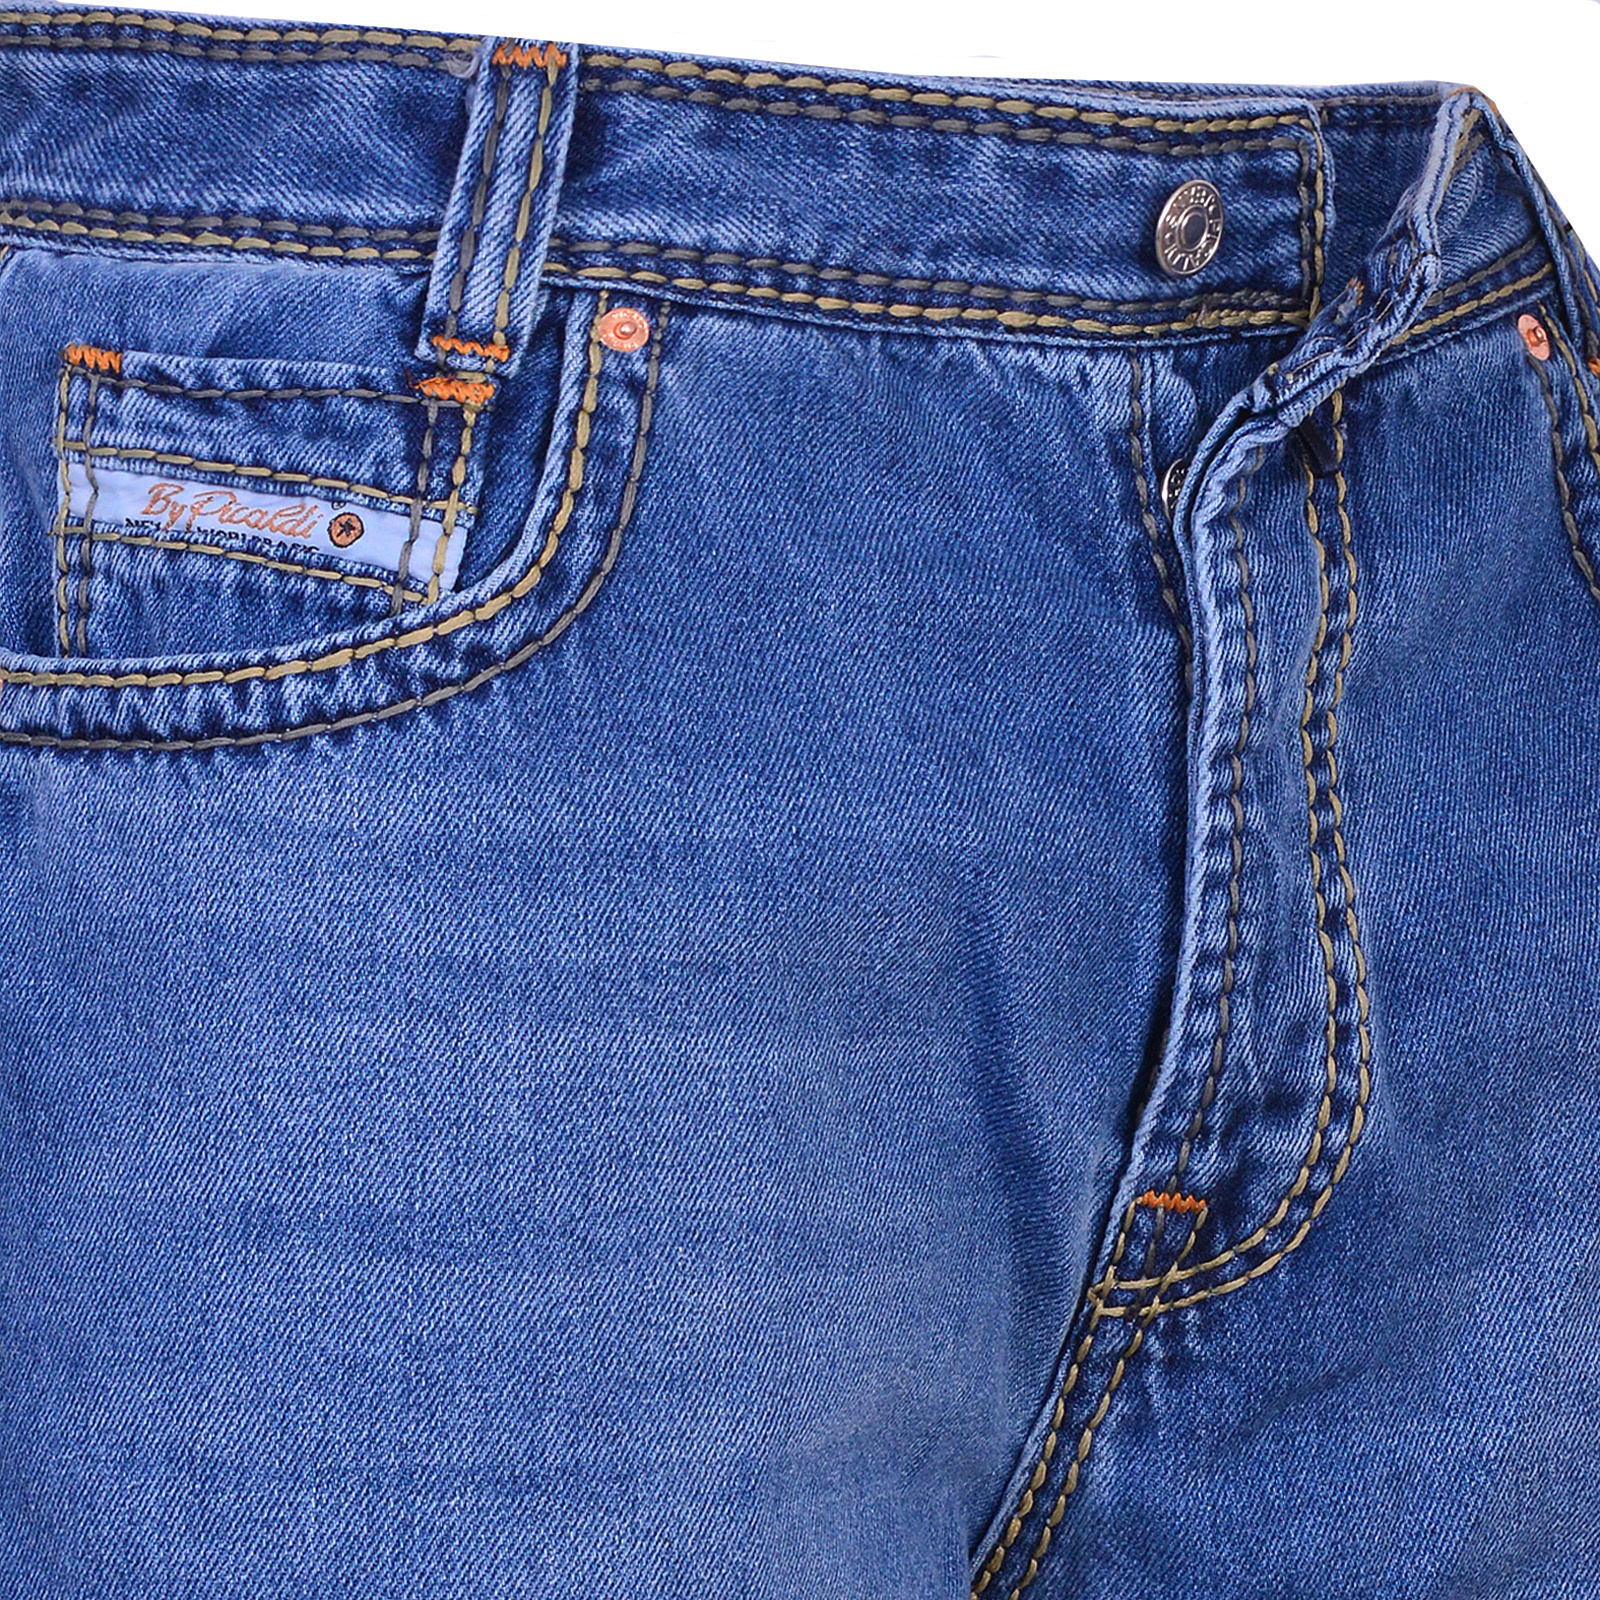 Picaldi Zicco 472 Jeans - TONY